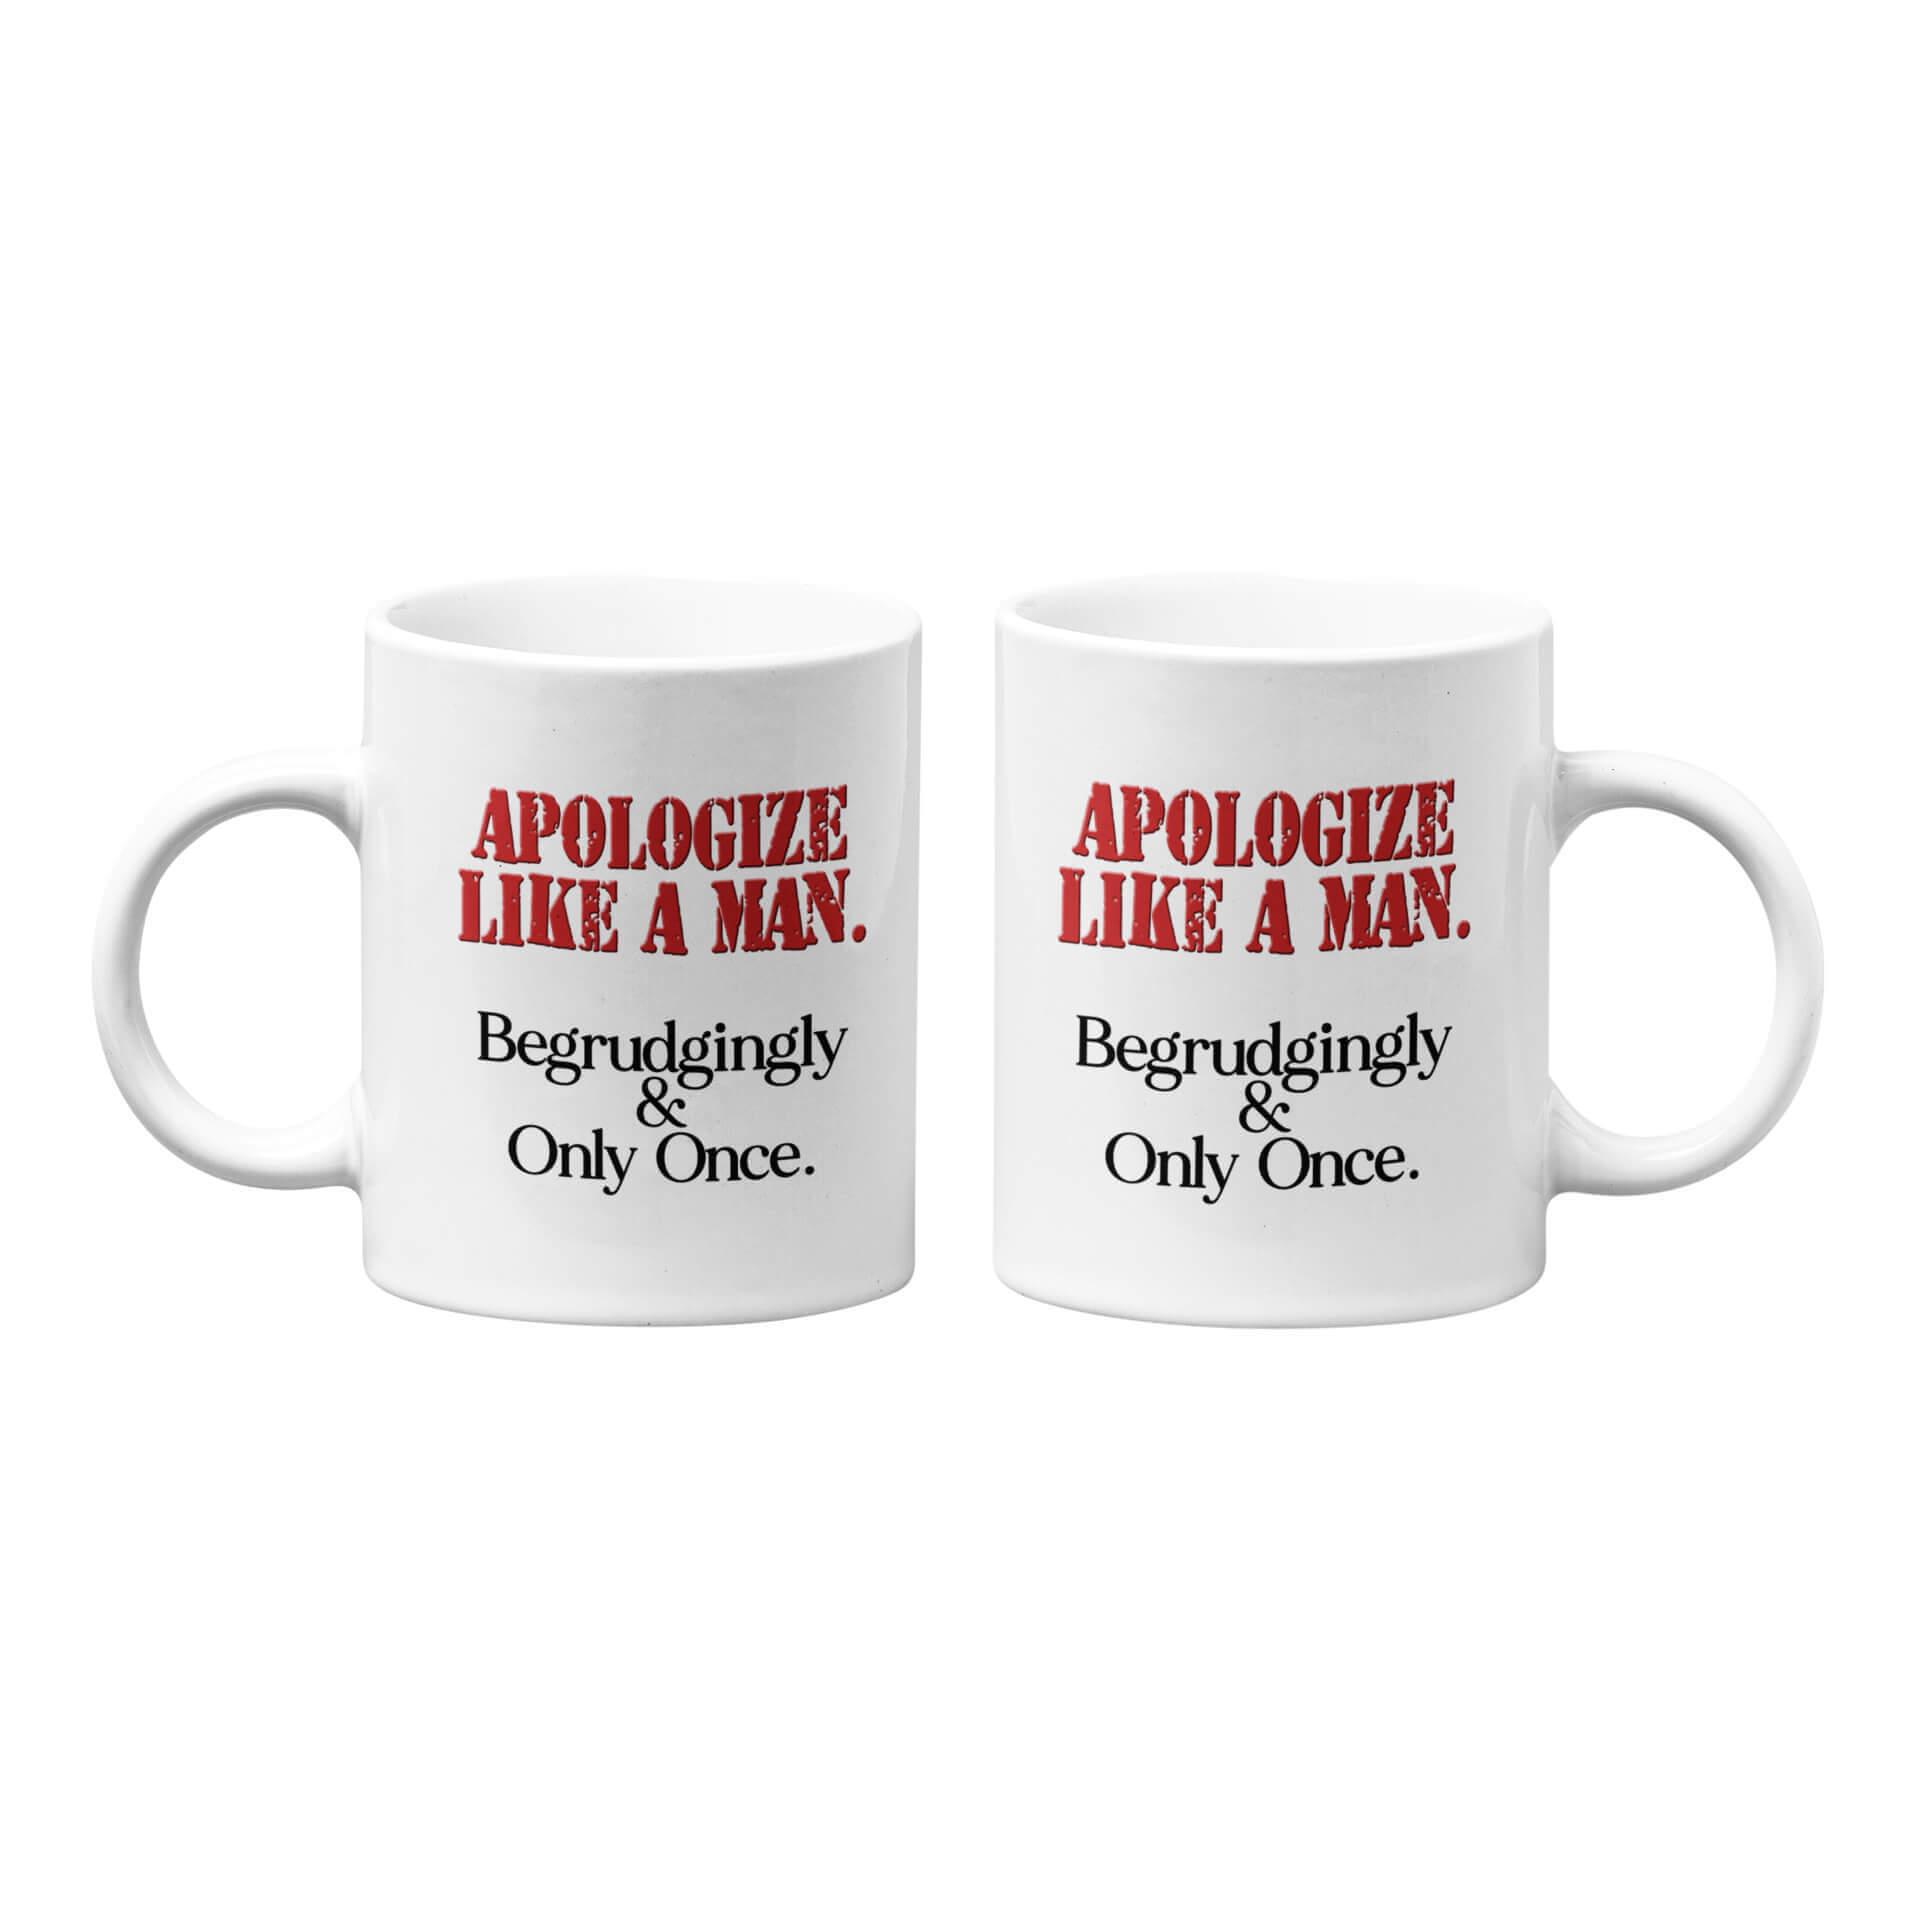 Apologize Like A Man Mug